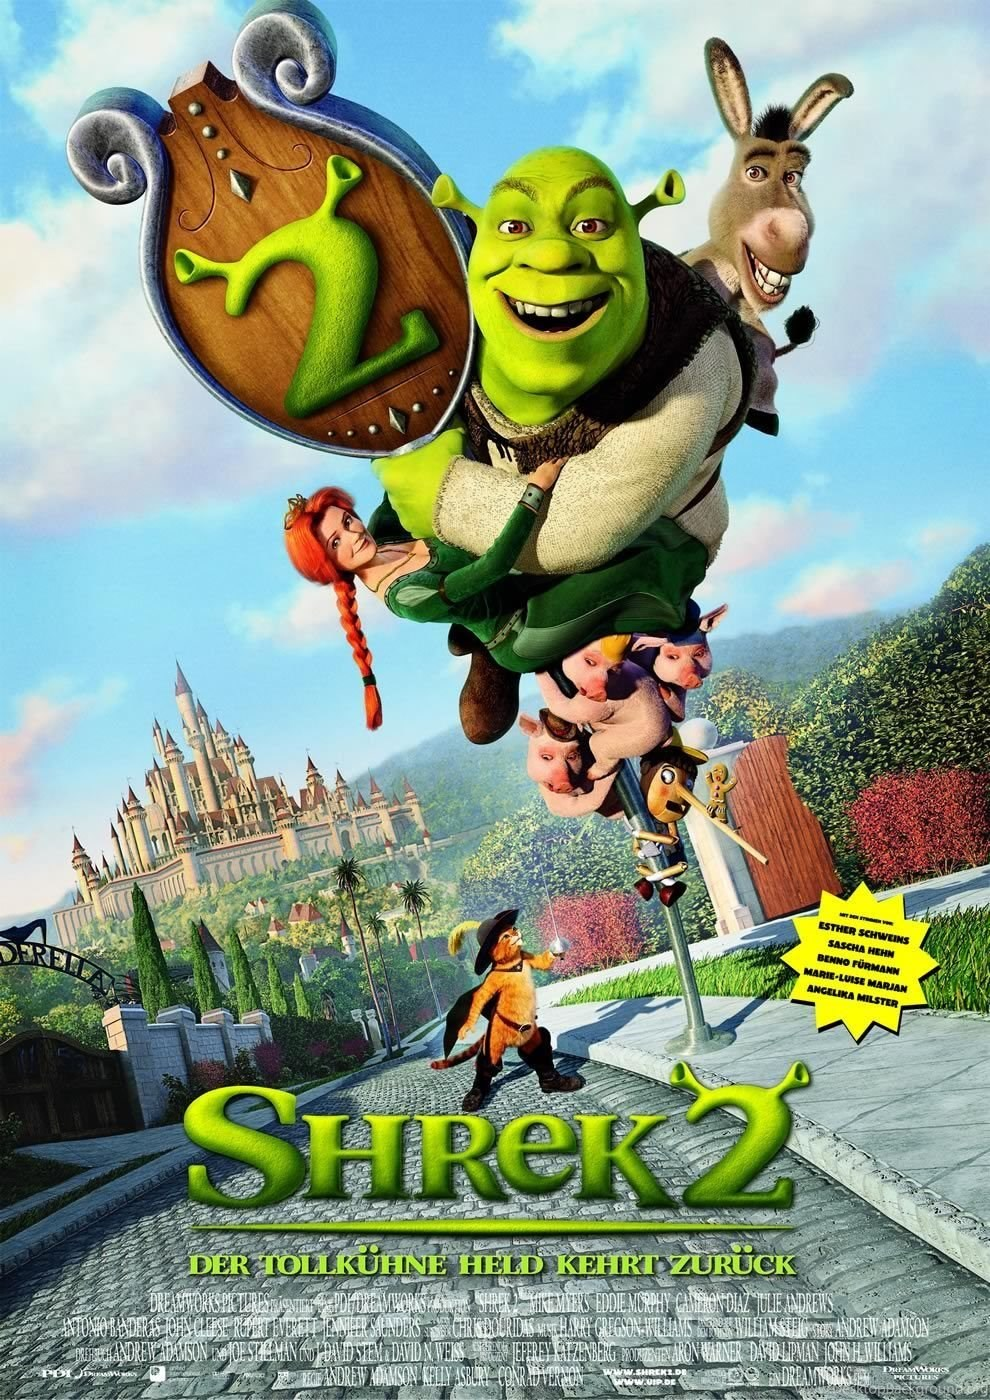 Shrek Shrek 2 4 High Definition Widescreen Wallpapers Desktop Background